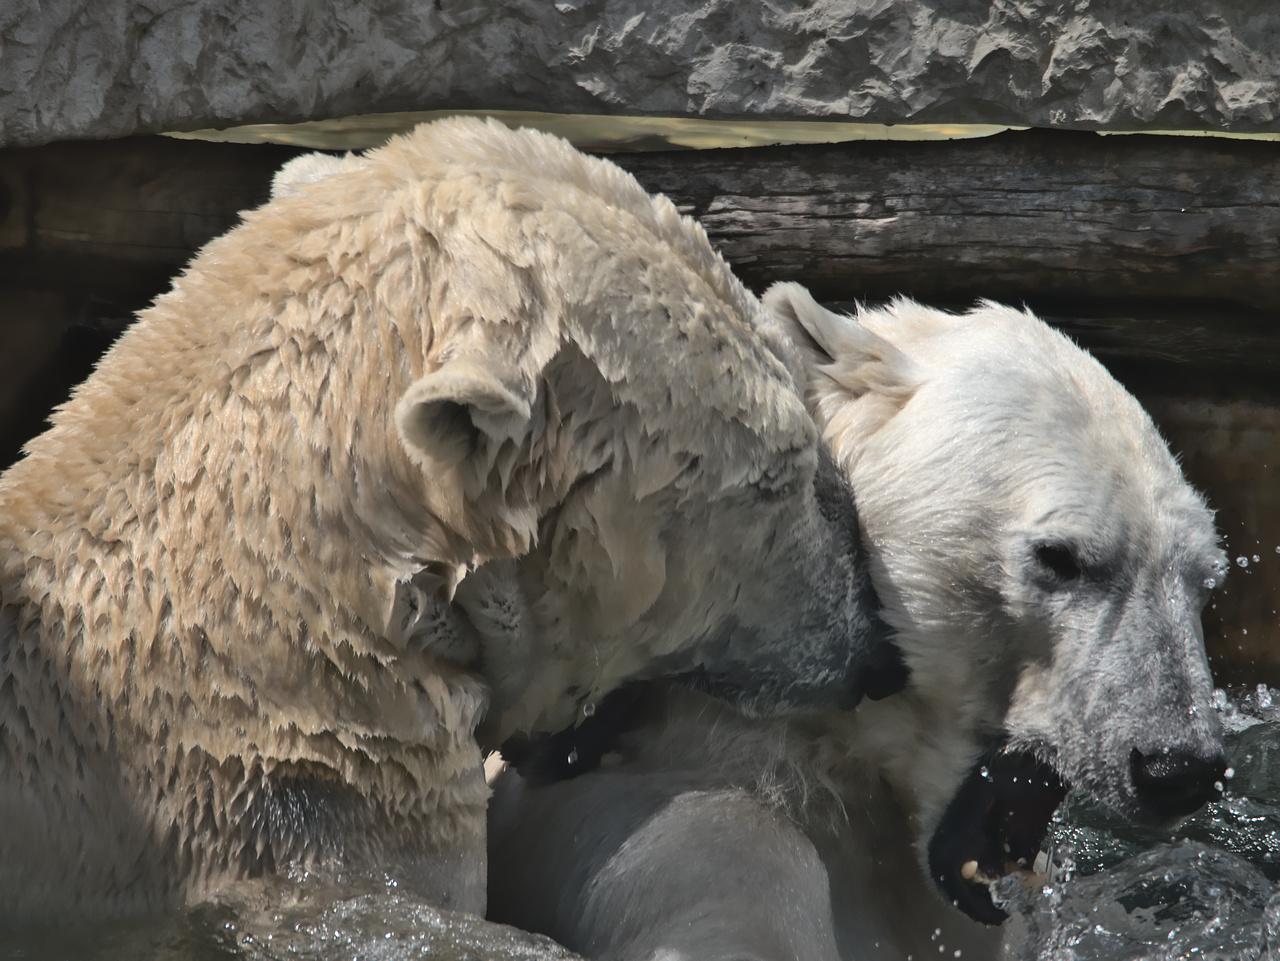 20200601_Zoo_Karlsruhe_011